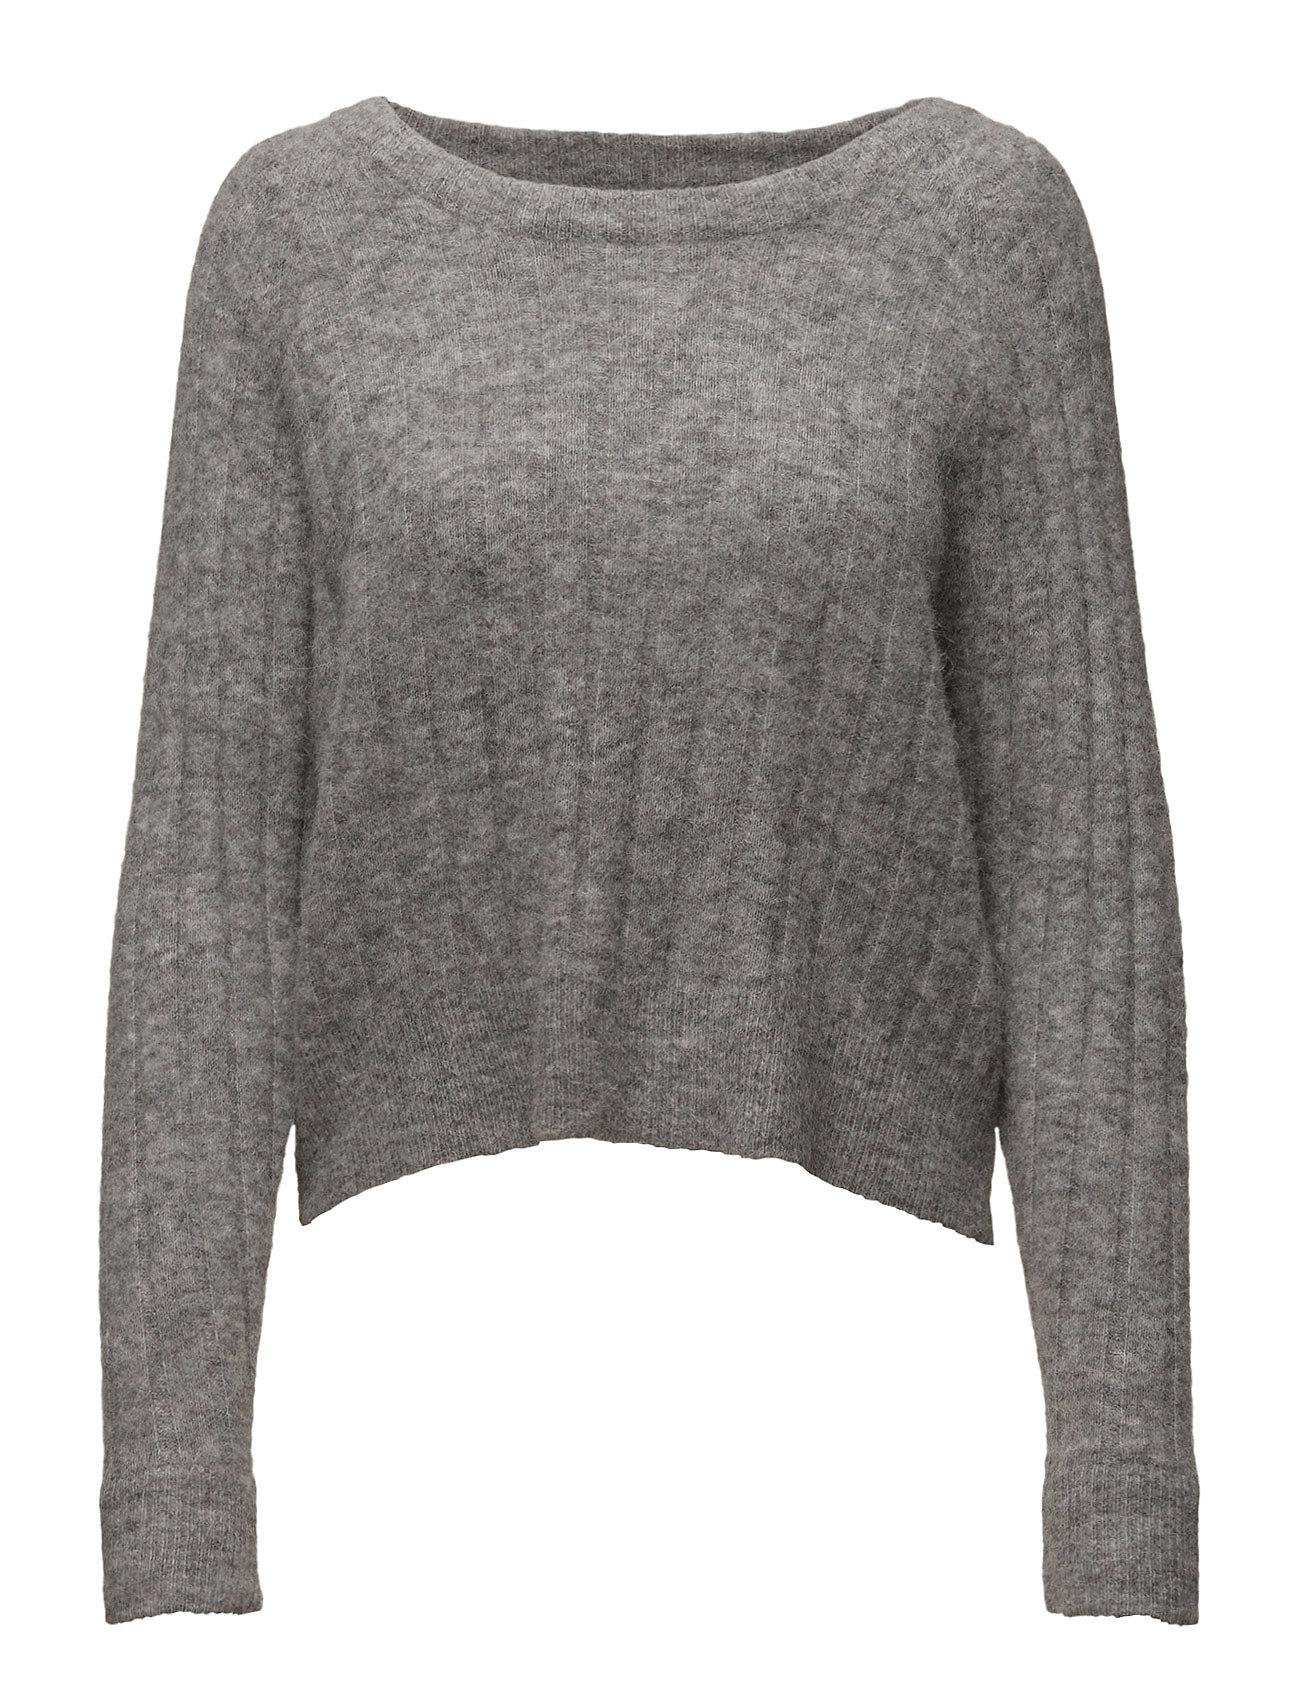 Nor O-N Short 7668 Samsøe & Samsøe Sweatshirts til Damer i Grey Mel.